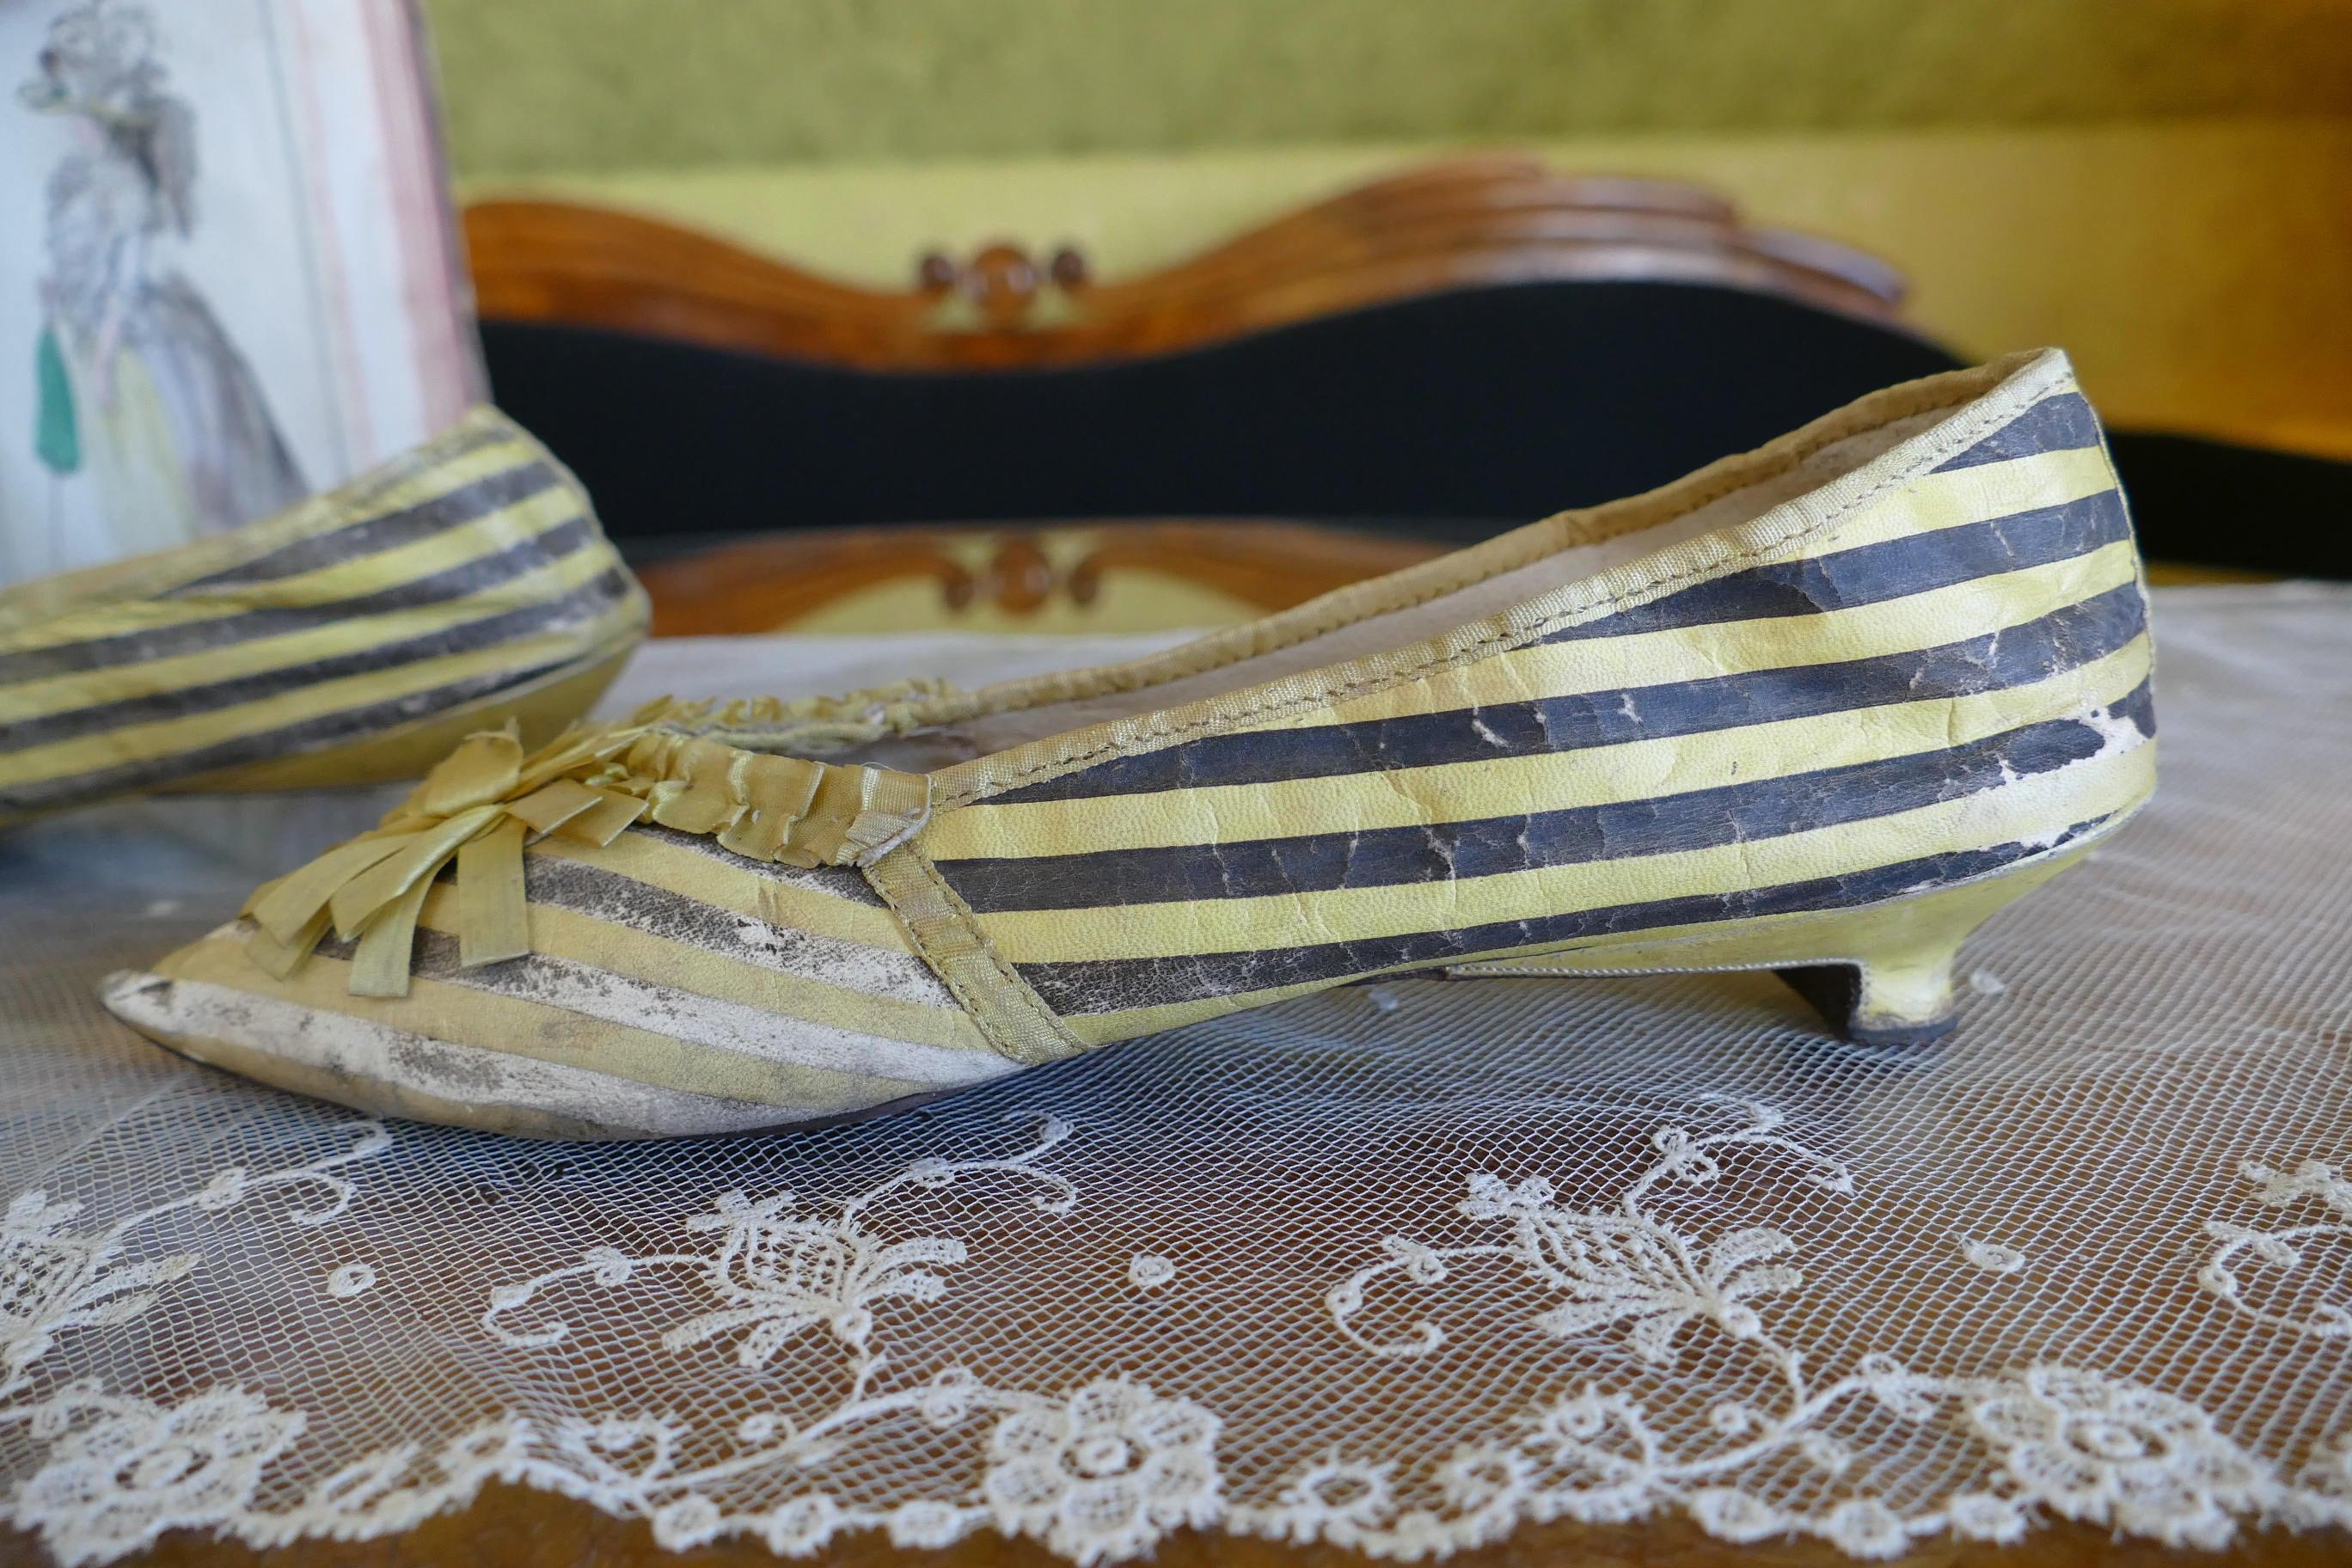 1790 Late antique Rococo Shoes, antique shoes, antique Late pumps, antike Schuhe, Rokoko, antique pumps 84a4db